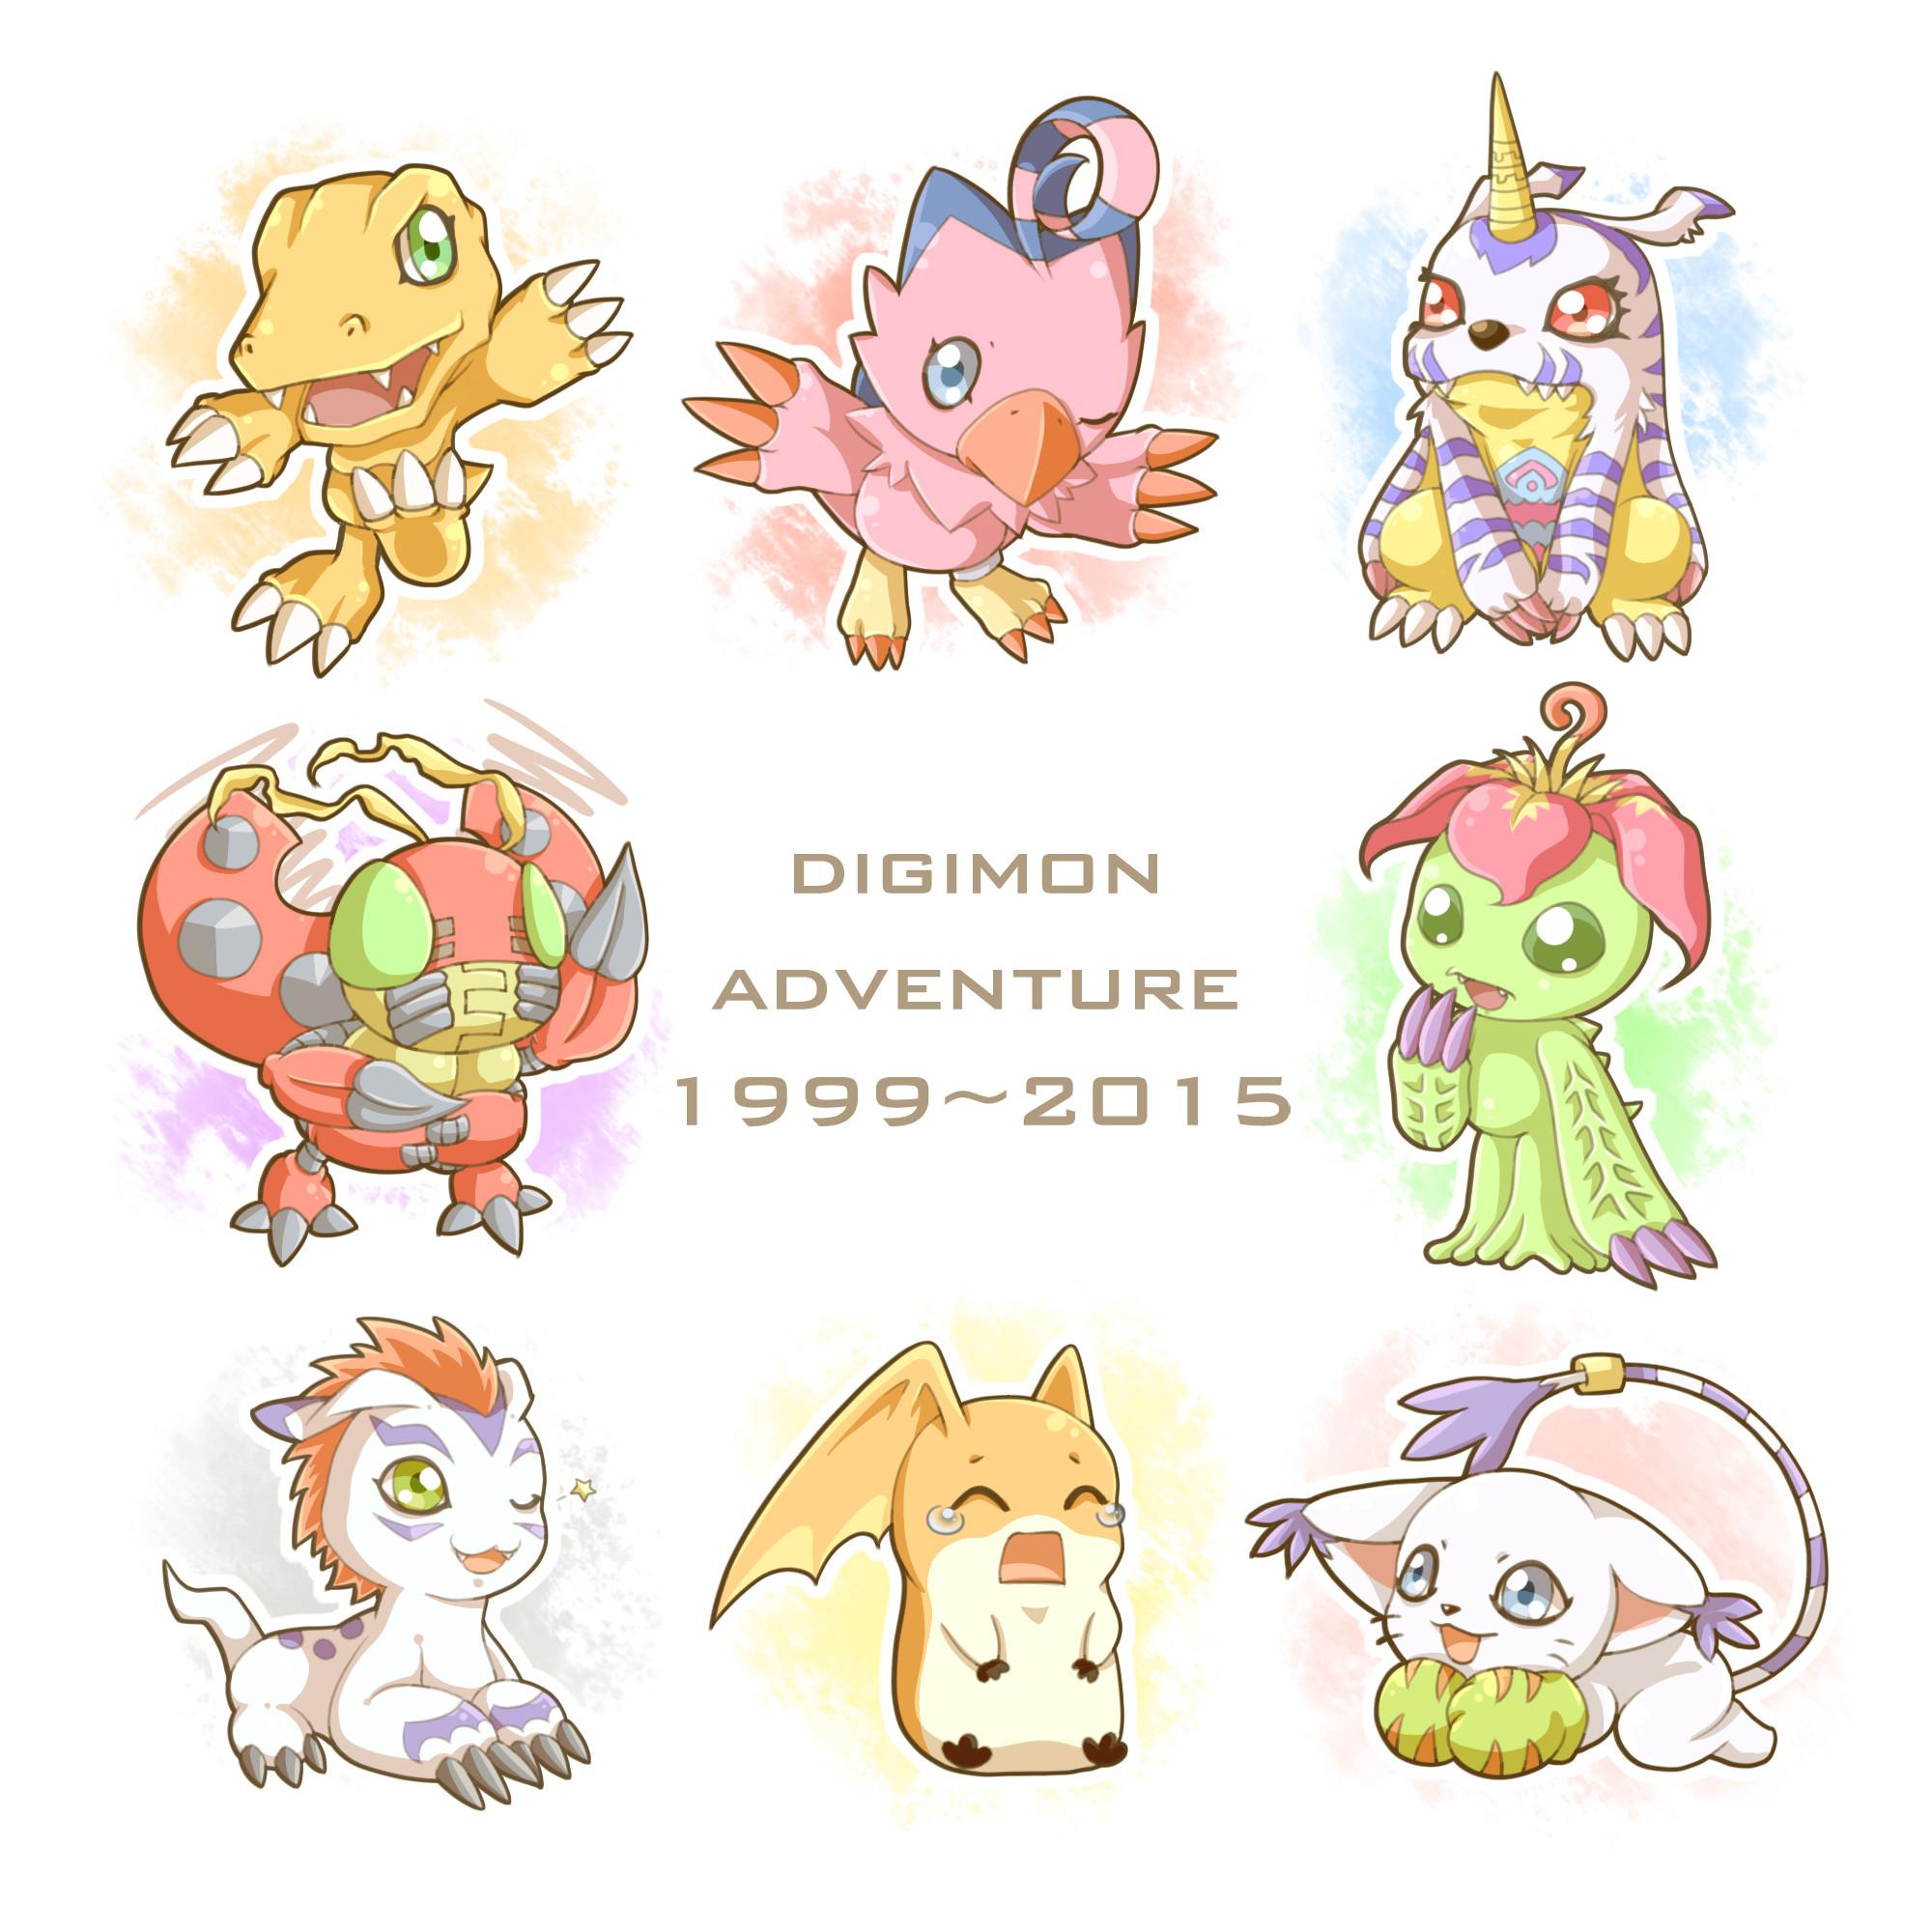 Res: 2000x2000, Digimon Adventure · download Digimon Adventure image